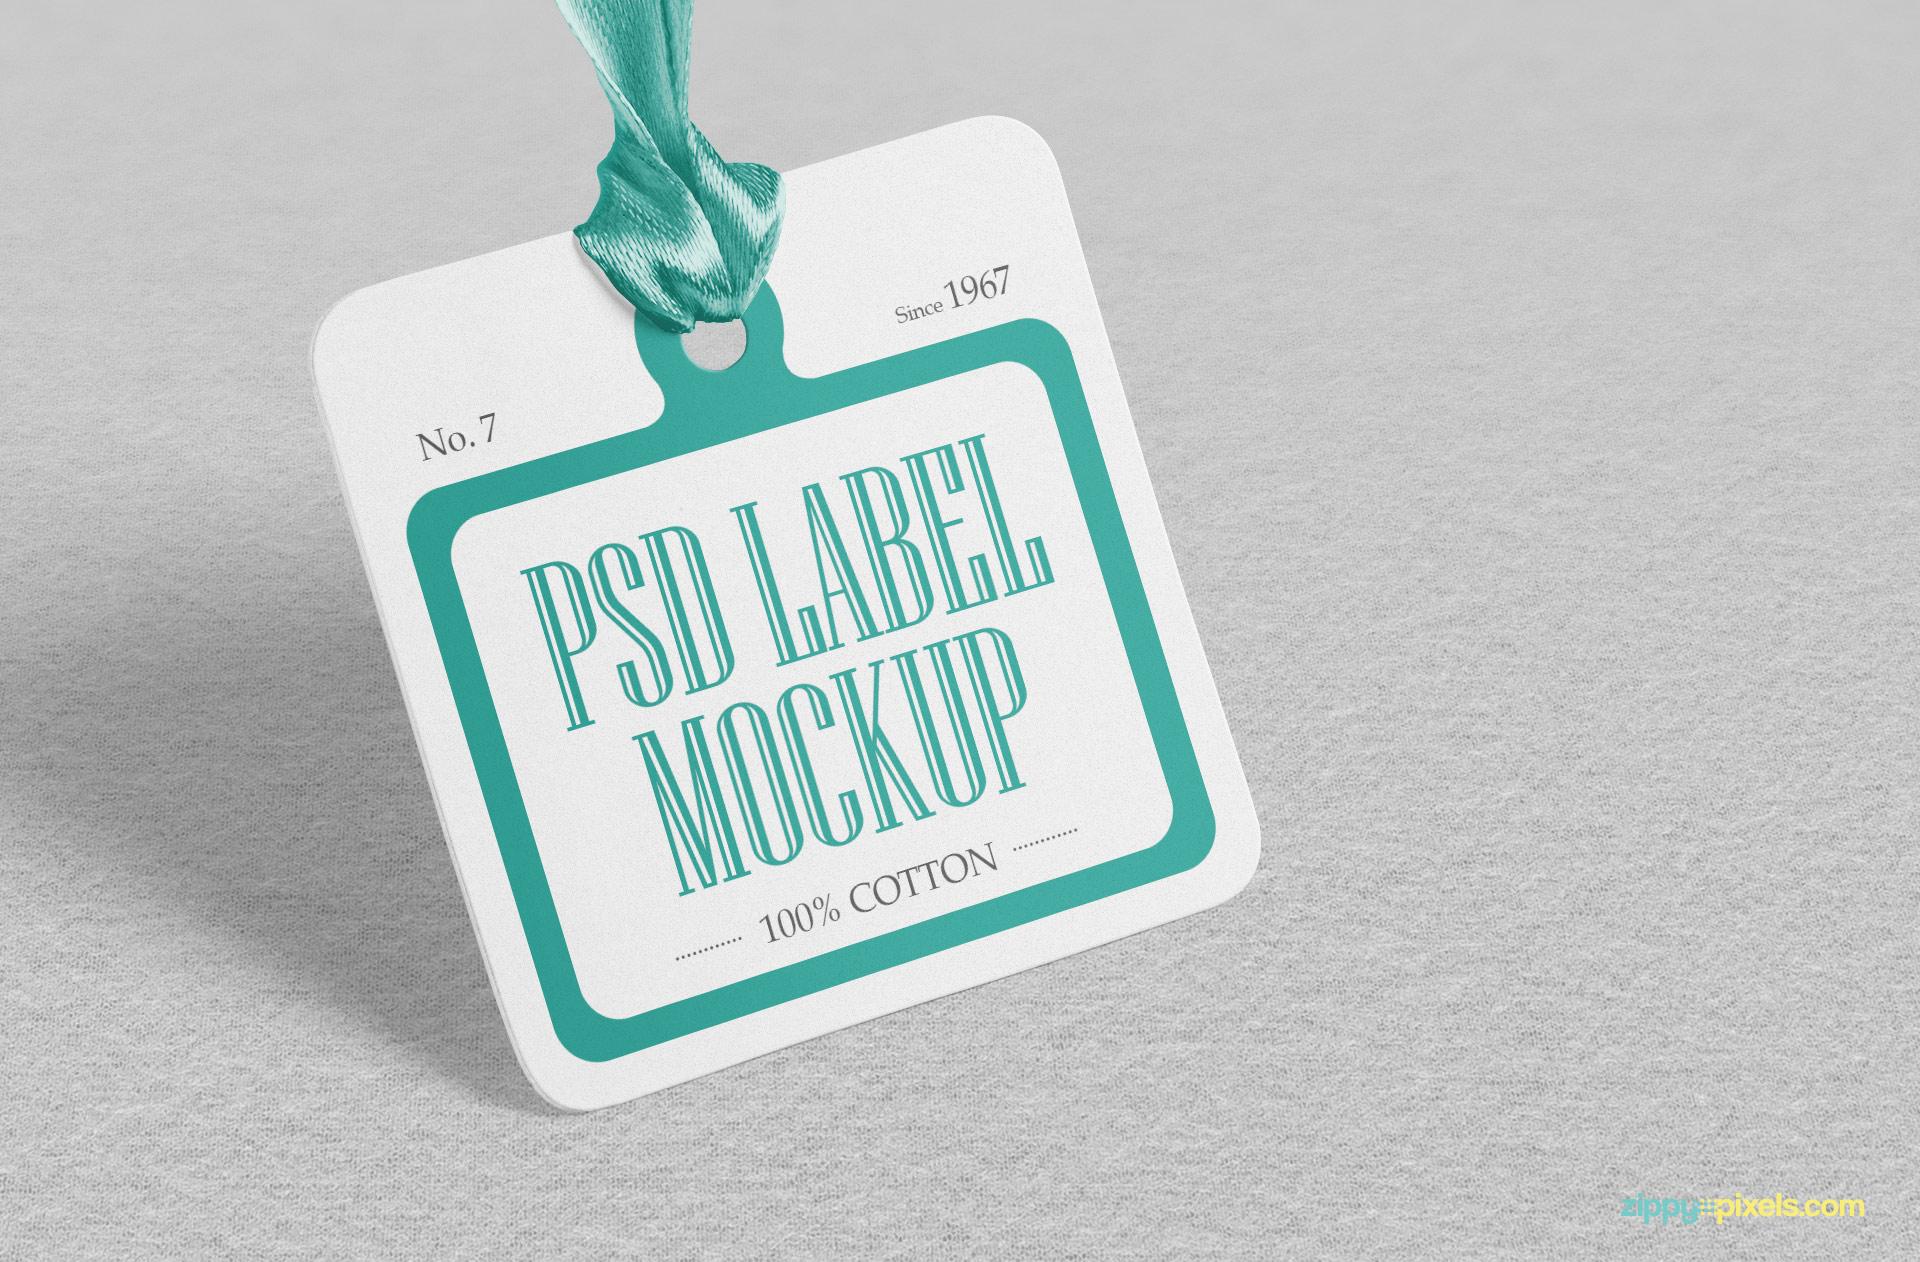 Square shaped PSD label mockup.